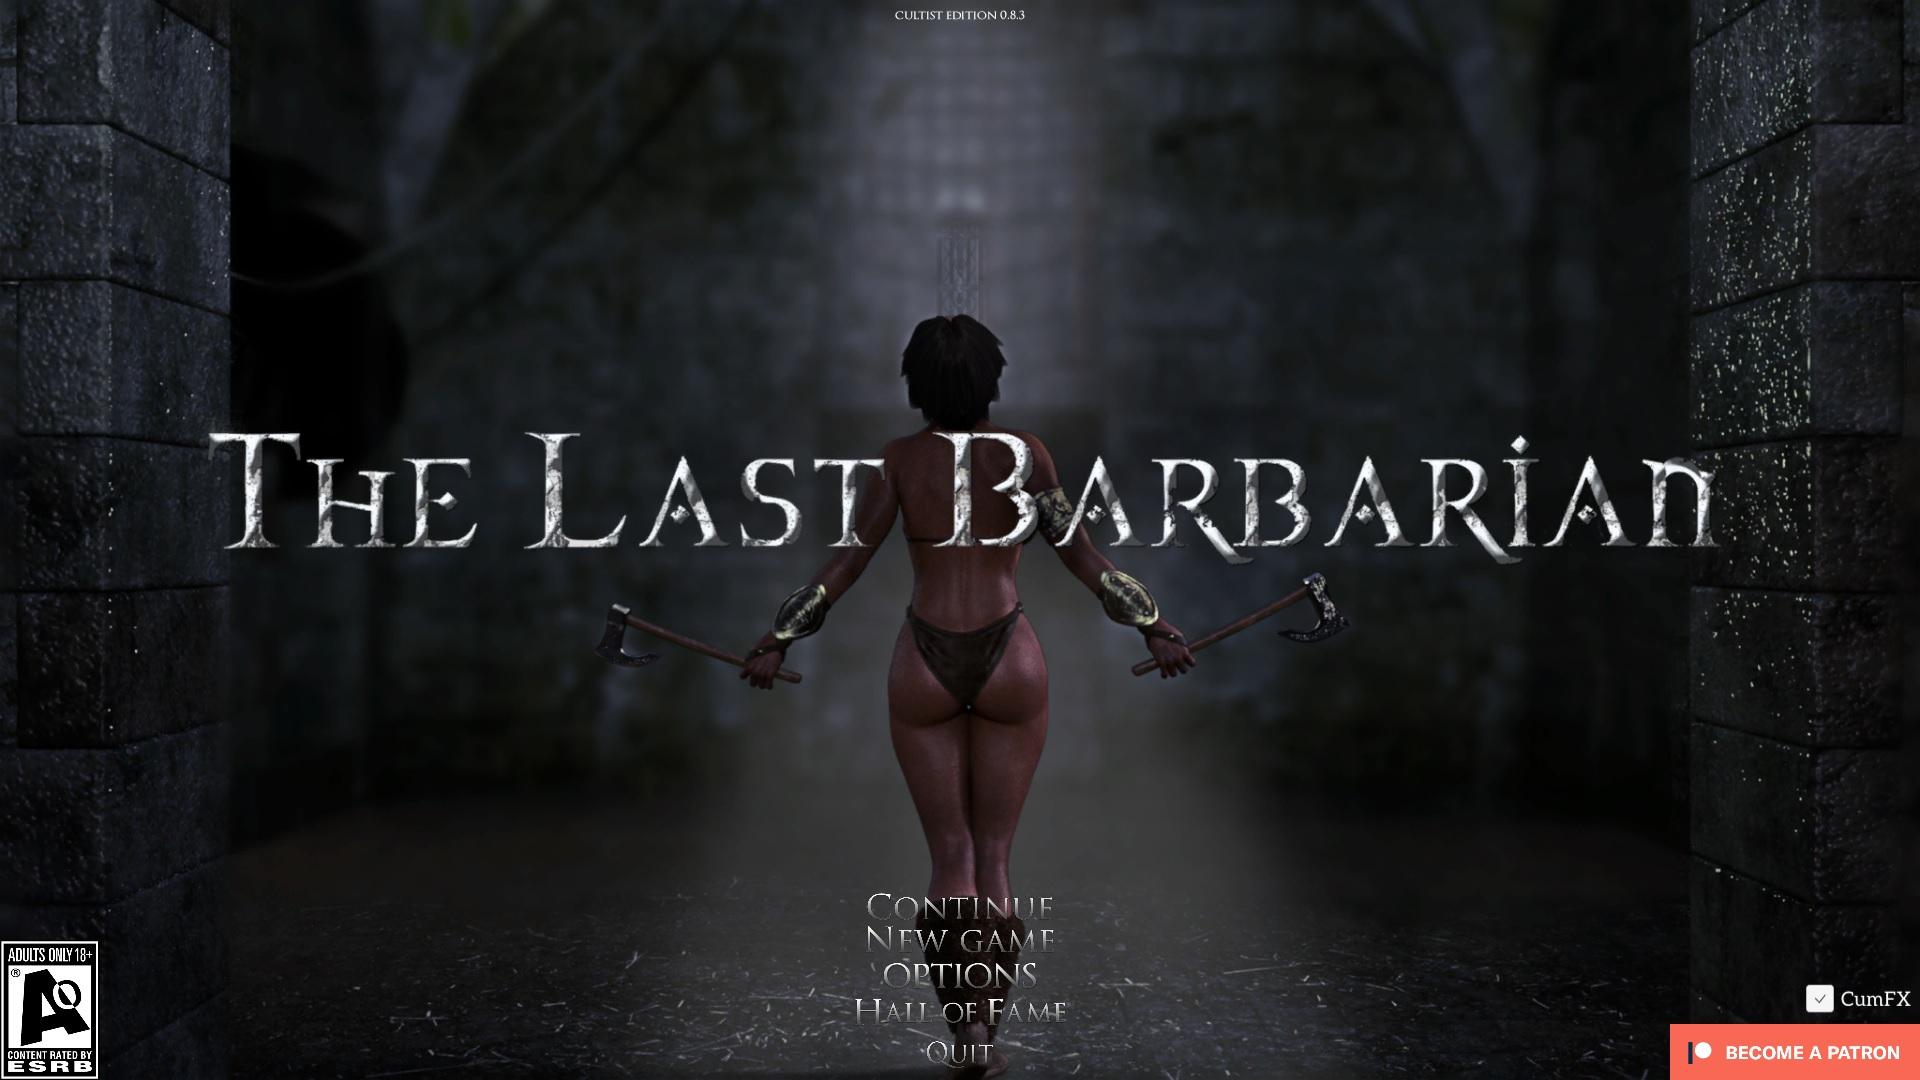 The Last Barbarian